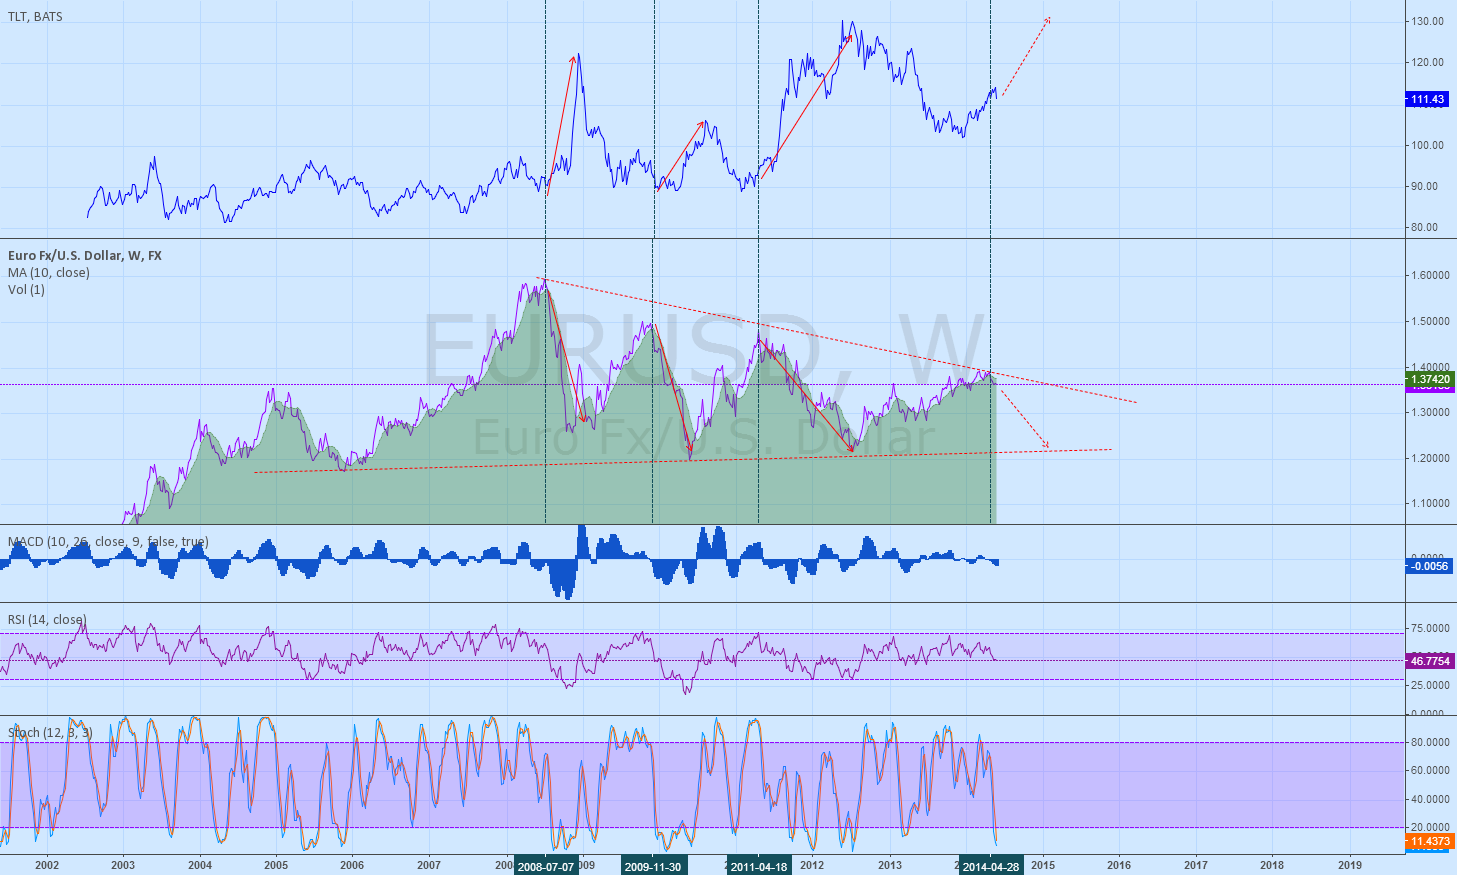 Lower EURUSD seems to favor TLT